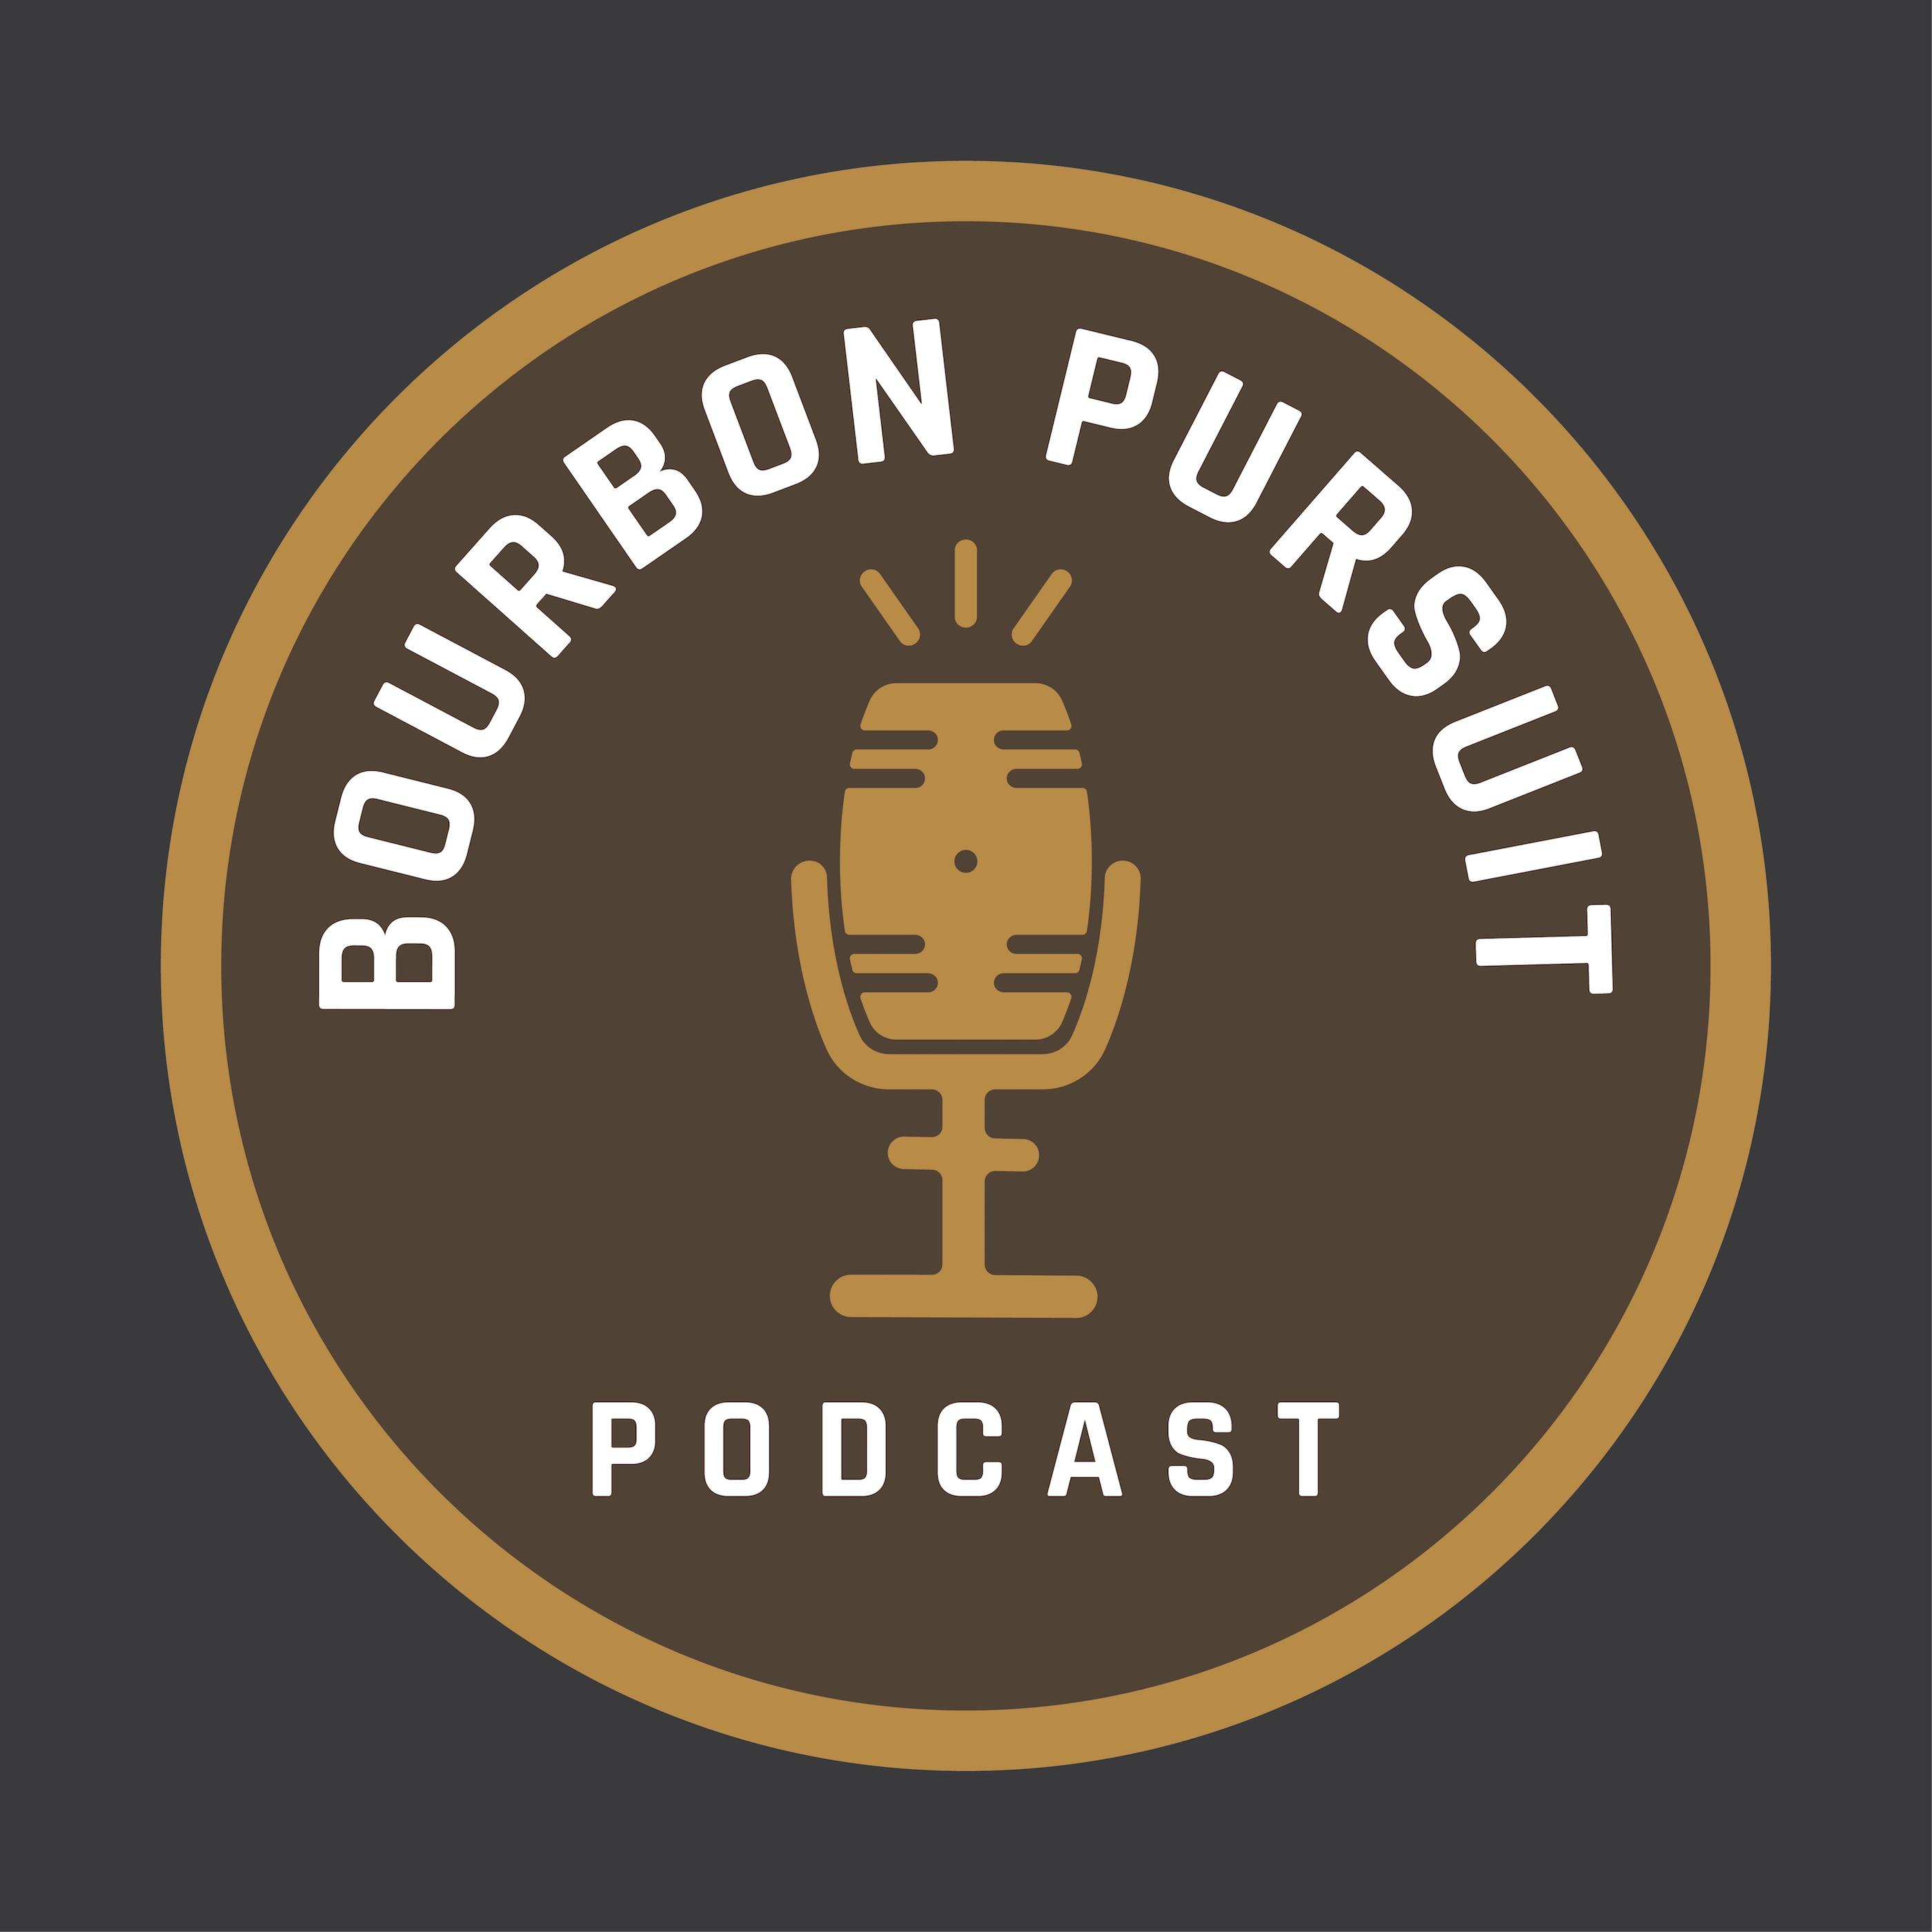 192 - Moonshiners, Jim Beam Legent, and Weller Full Proof on Bourbon